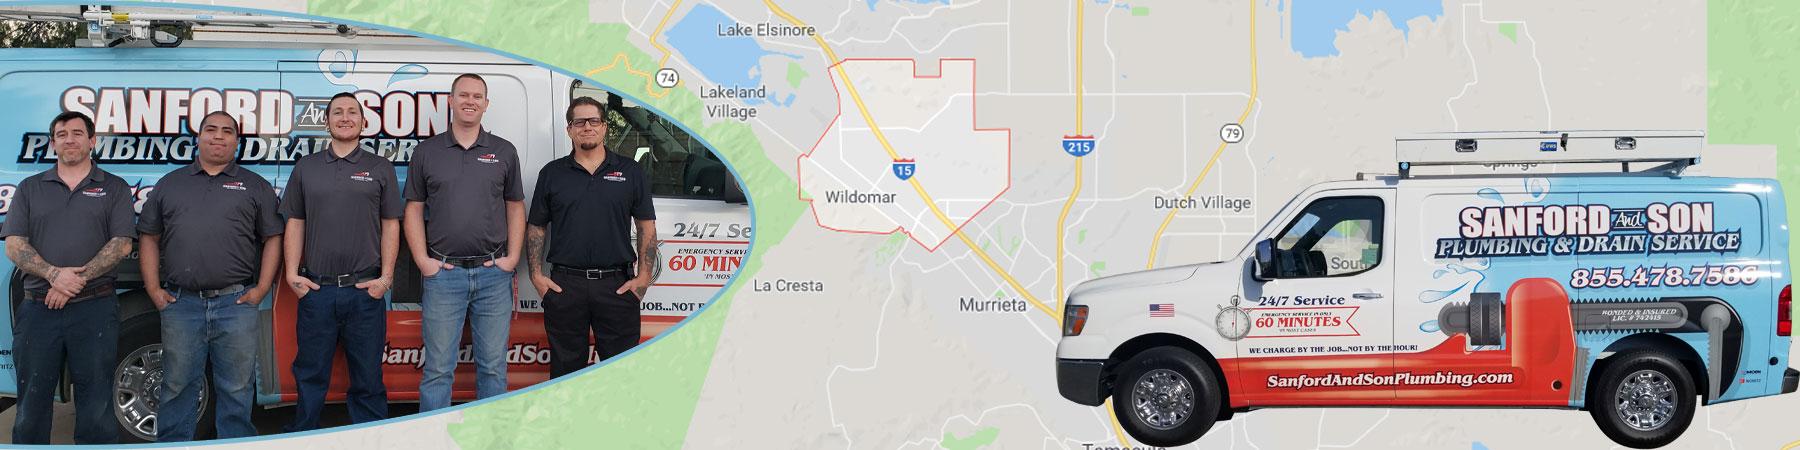 Plumbing Services Wildomar, California